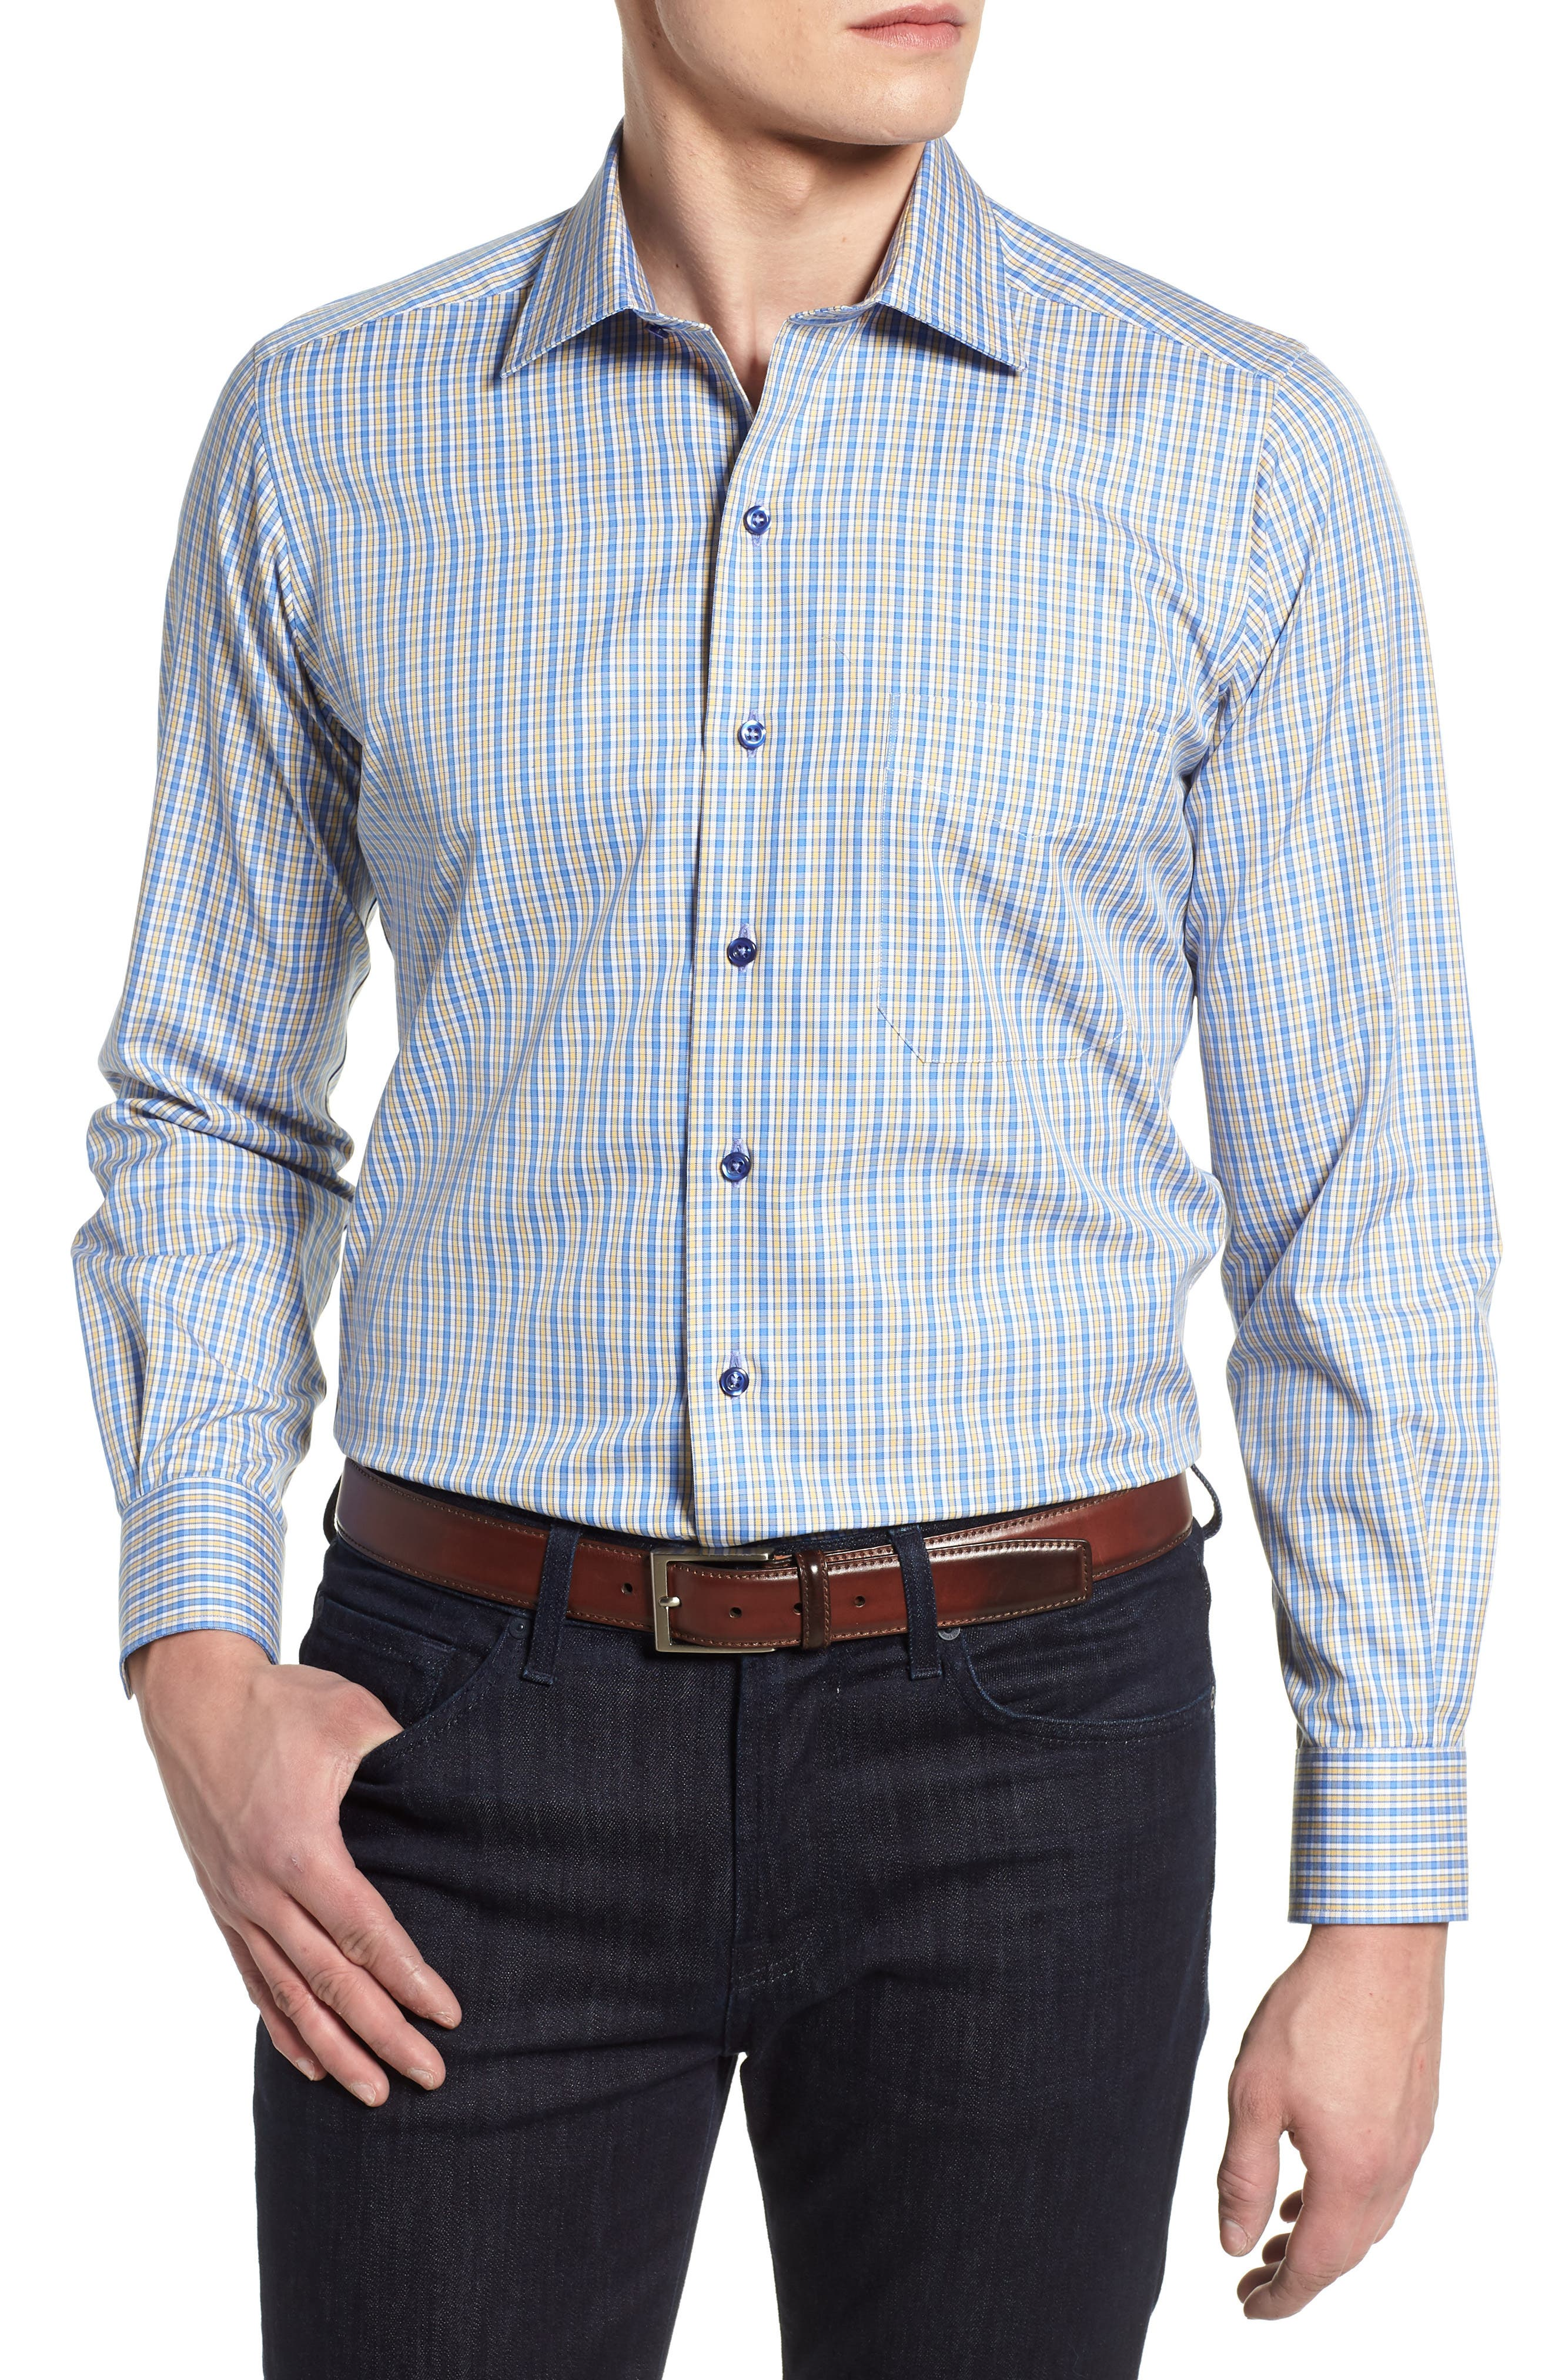 DAVID DONAHUE Sport Shirt, Main, color, 471